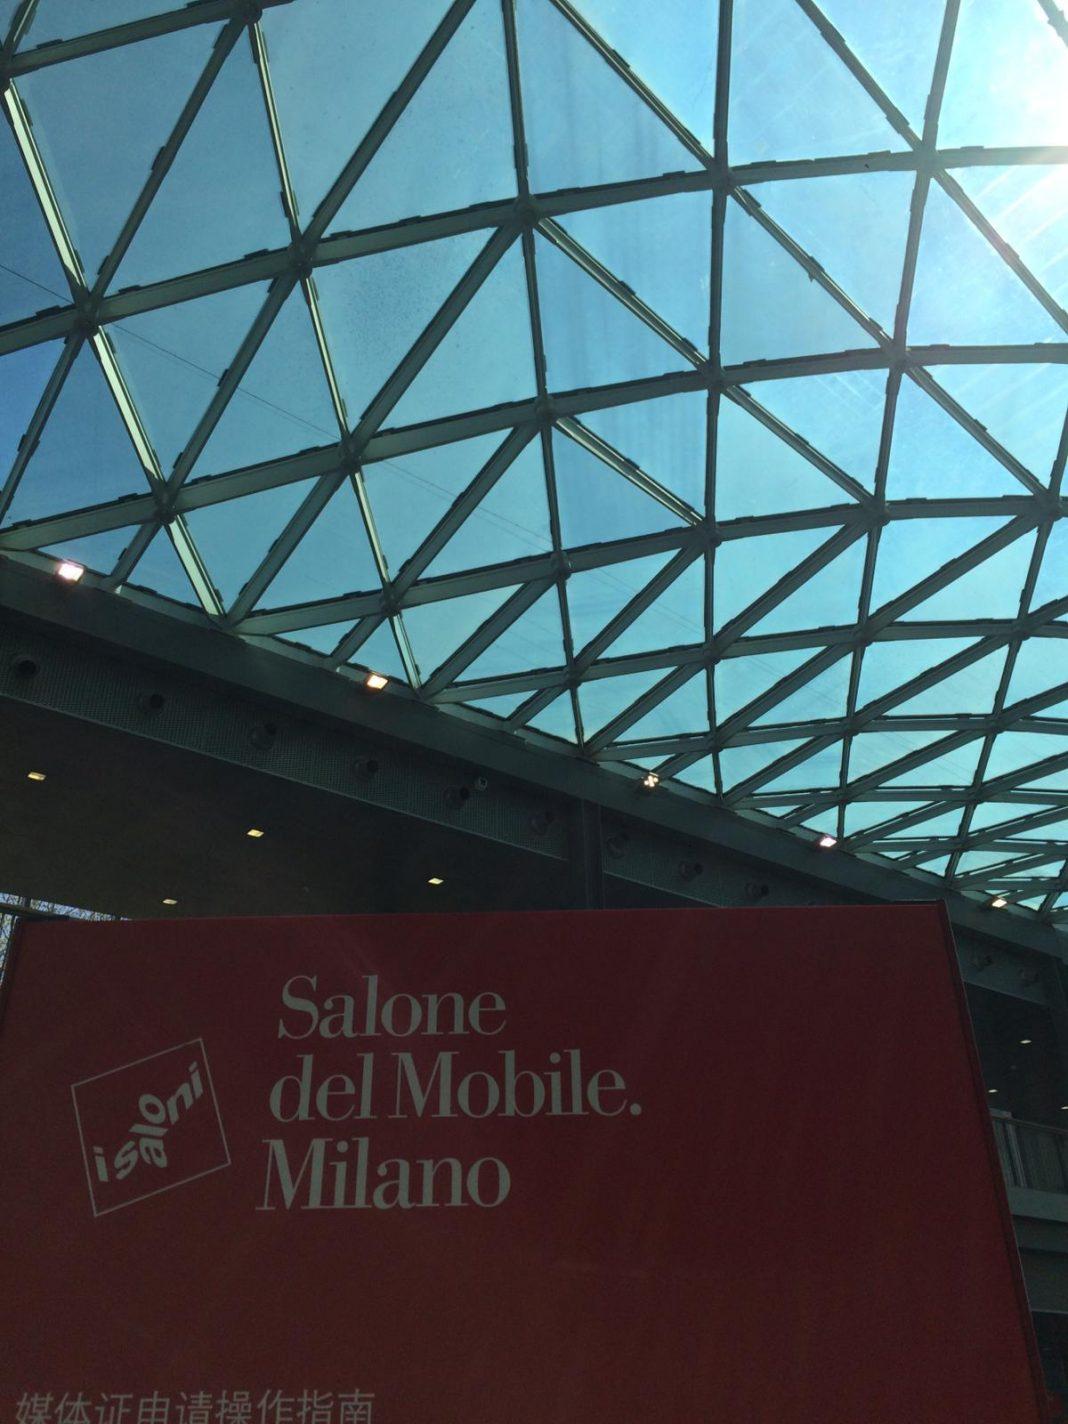 Salone-del-MOBILE-2019-Trendscout-Torsten-Müller-auf-der-Messe-in-Mailand-EUROLUCE-Milan-Milano